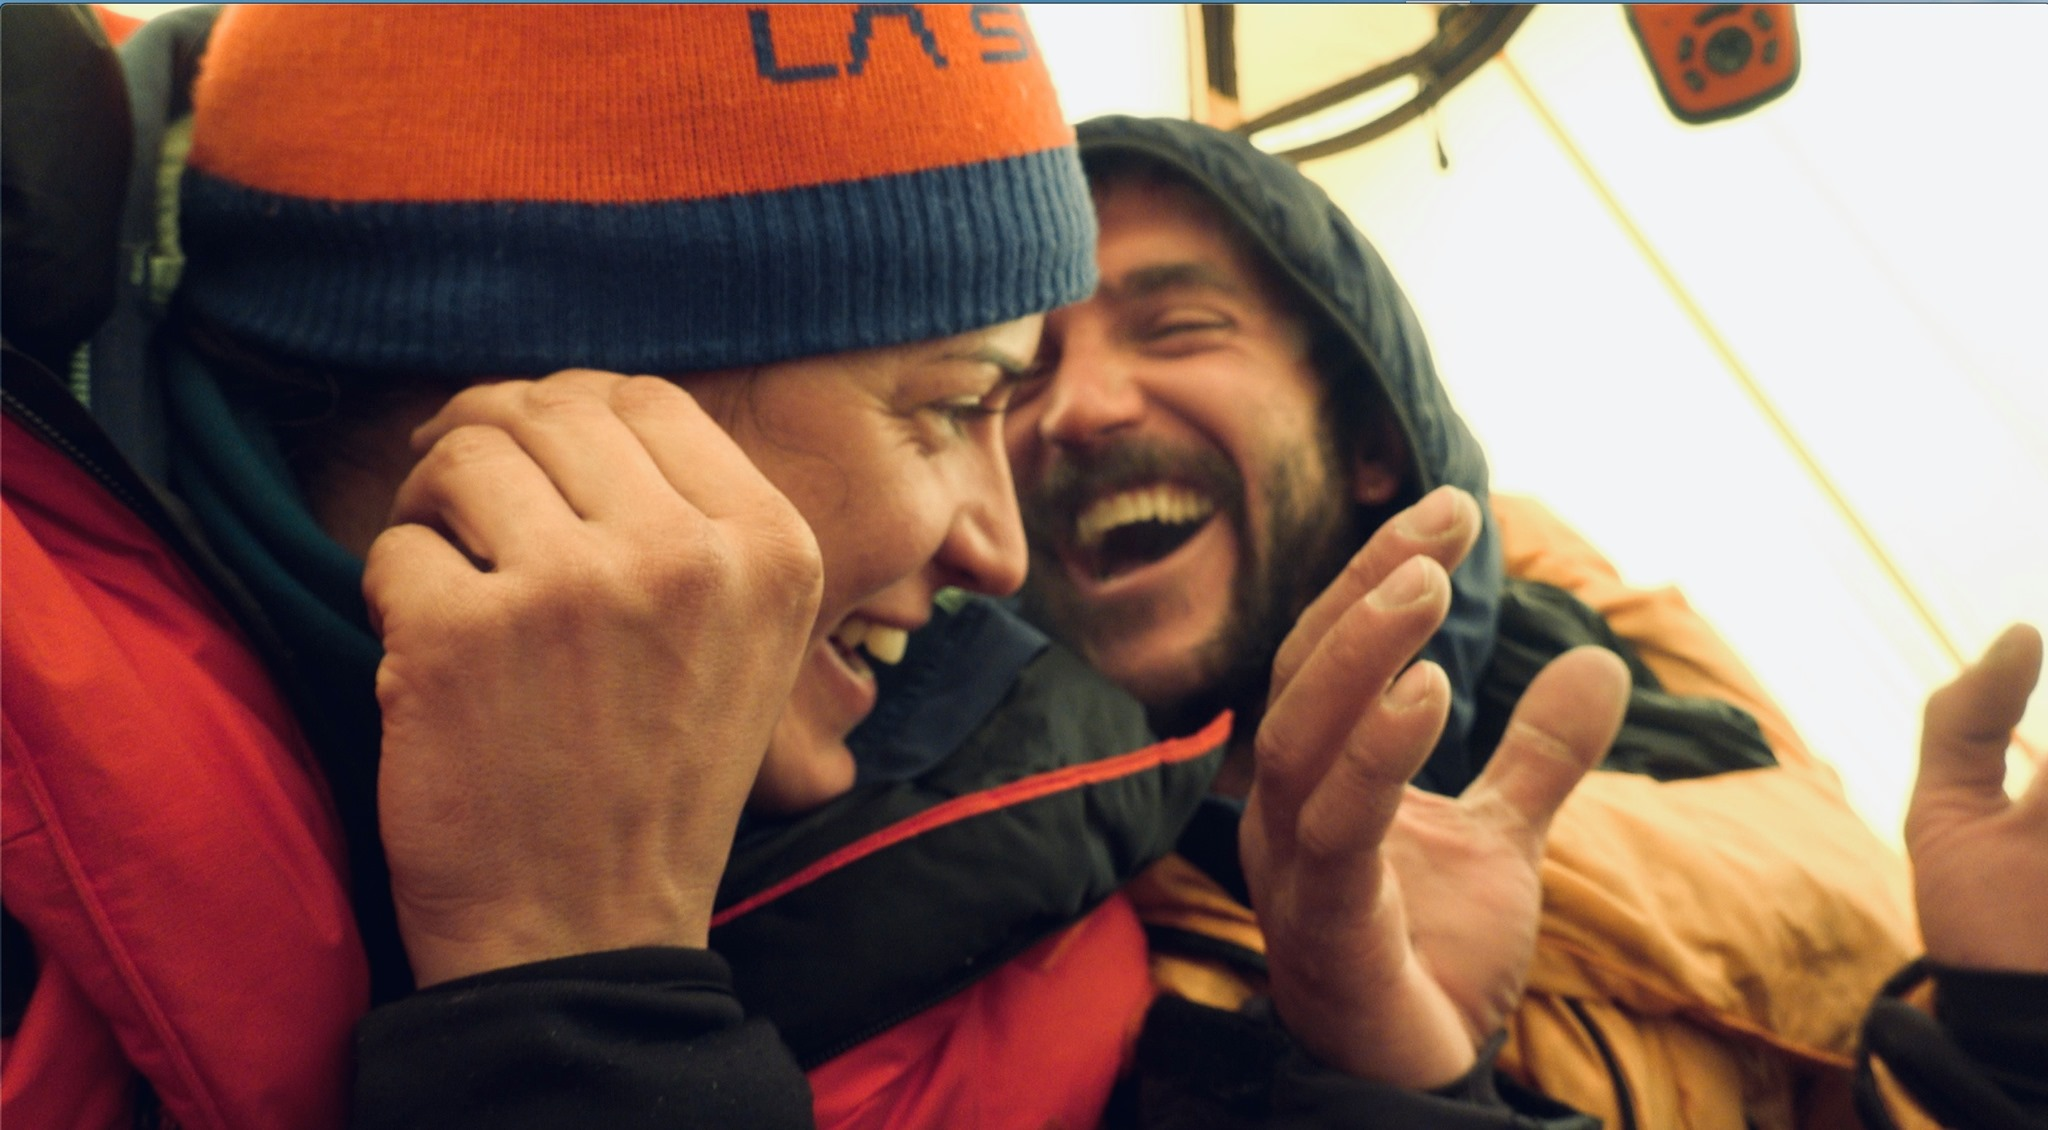 Tamara Lunger és Juan Pablo Mohr